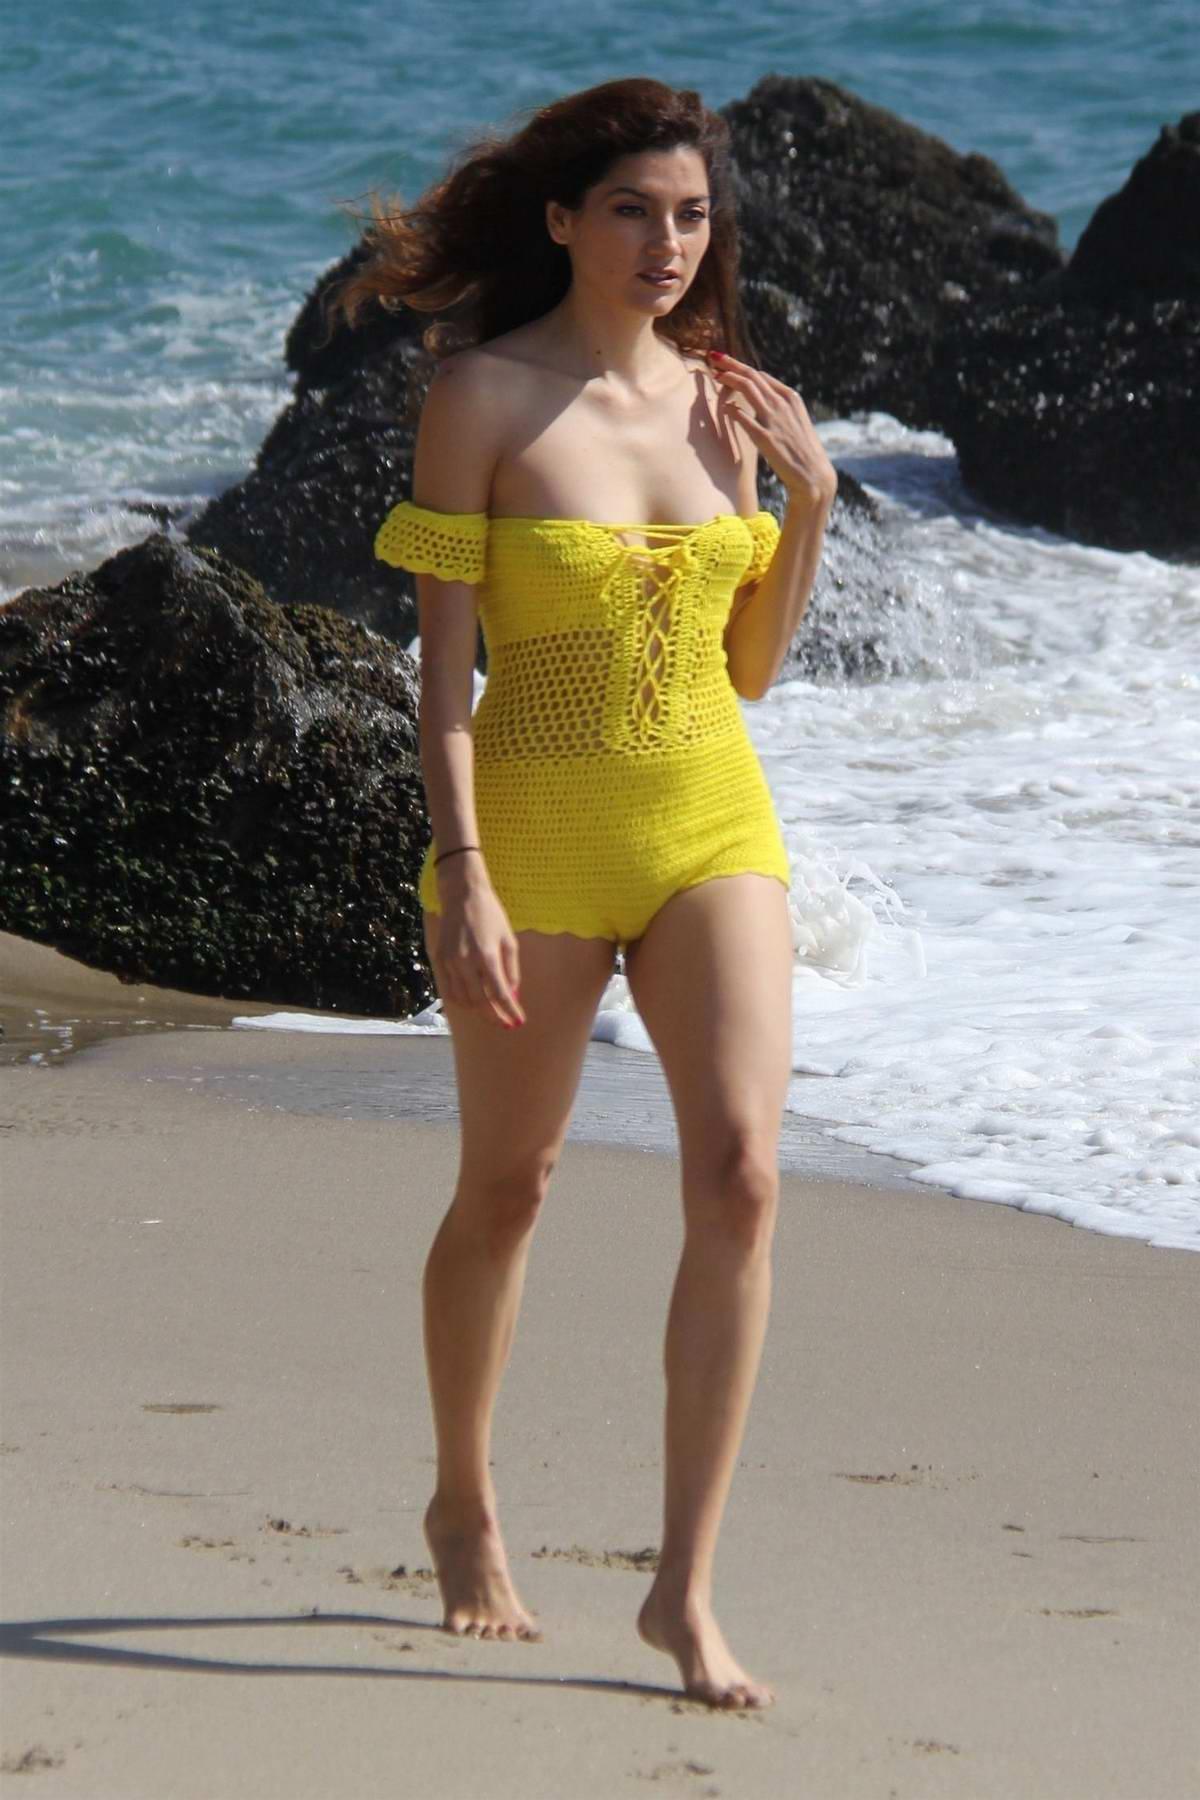 Blanca Blanco hits the beach in a yellow knit swimsuit in Malibu, California